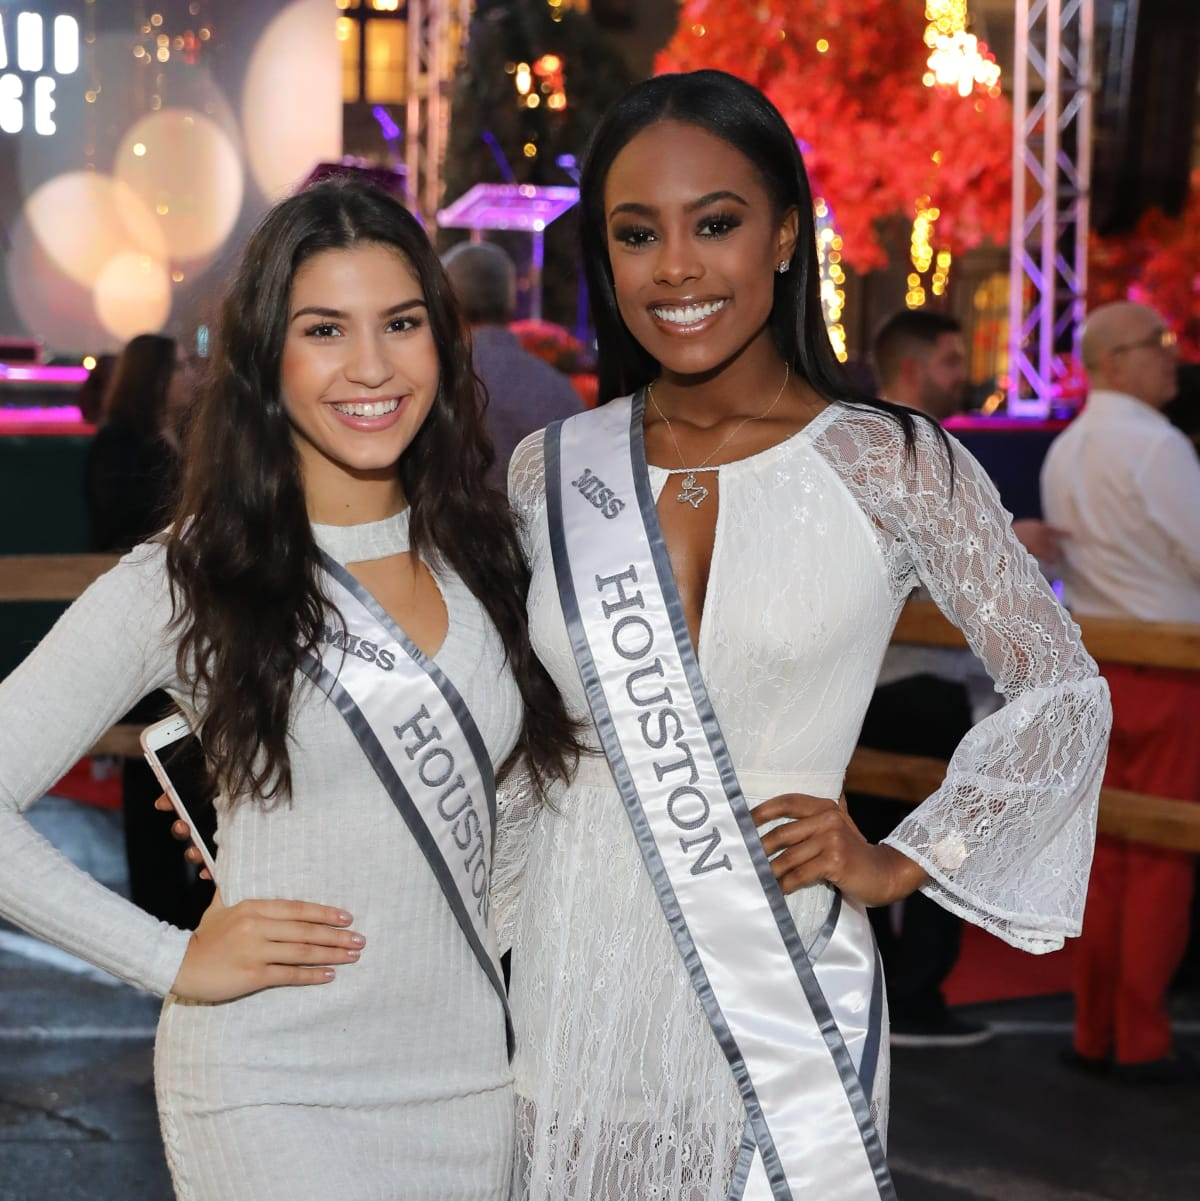 Miss Teen Houston 2017 Yasmine Moussa, Miss Houston Hannah Johannes at Holiday Shopping Card